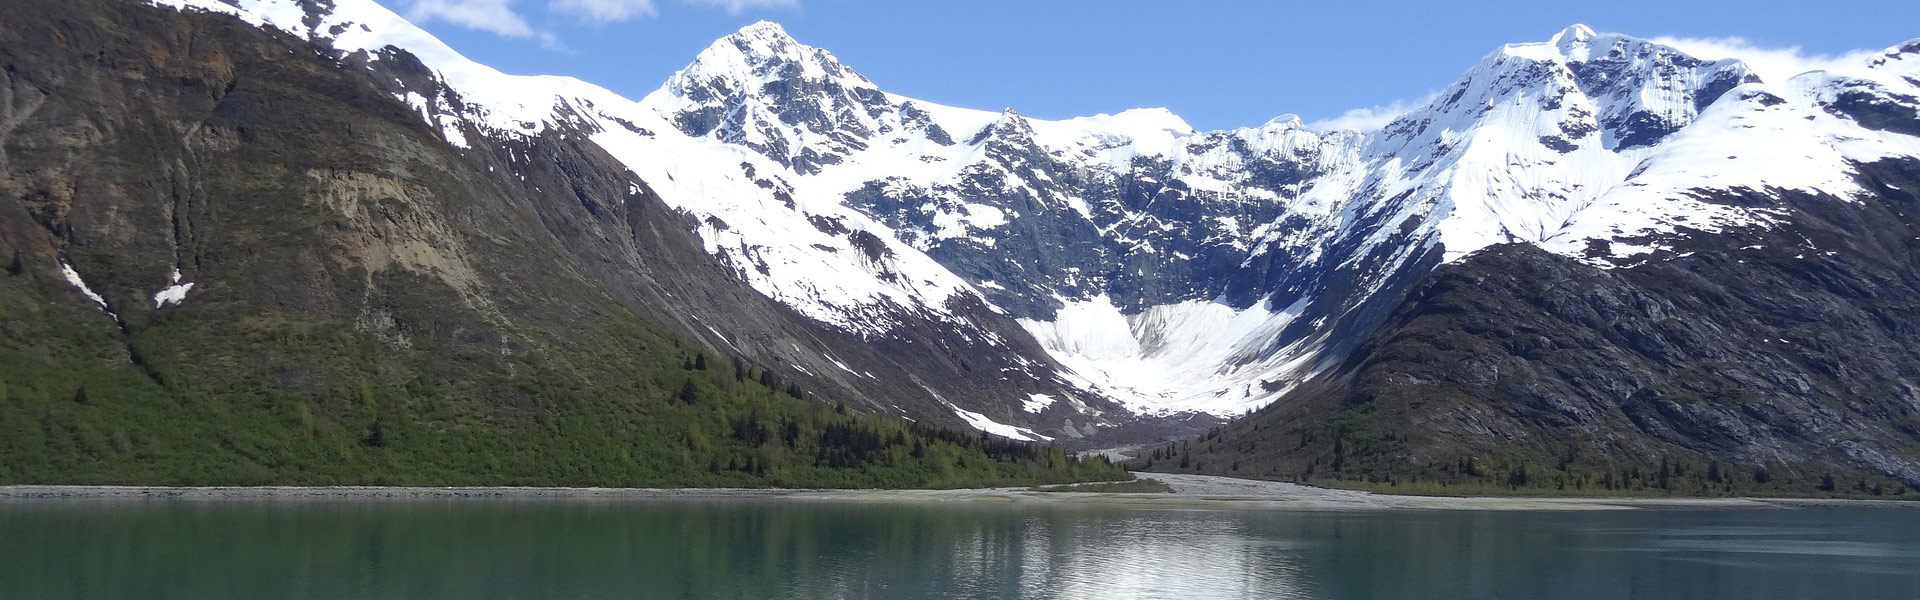 Alaska cruises resume with 7 Night Itineraries featuring Glacier Bay